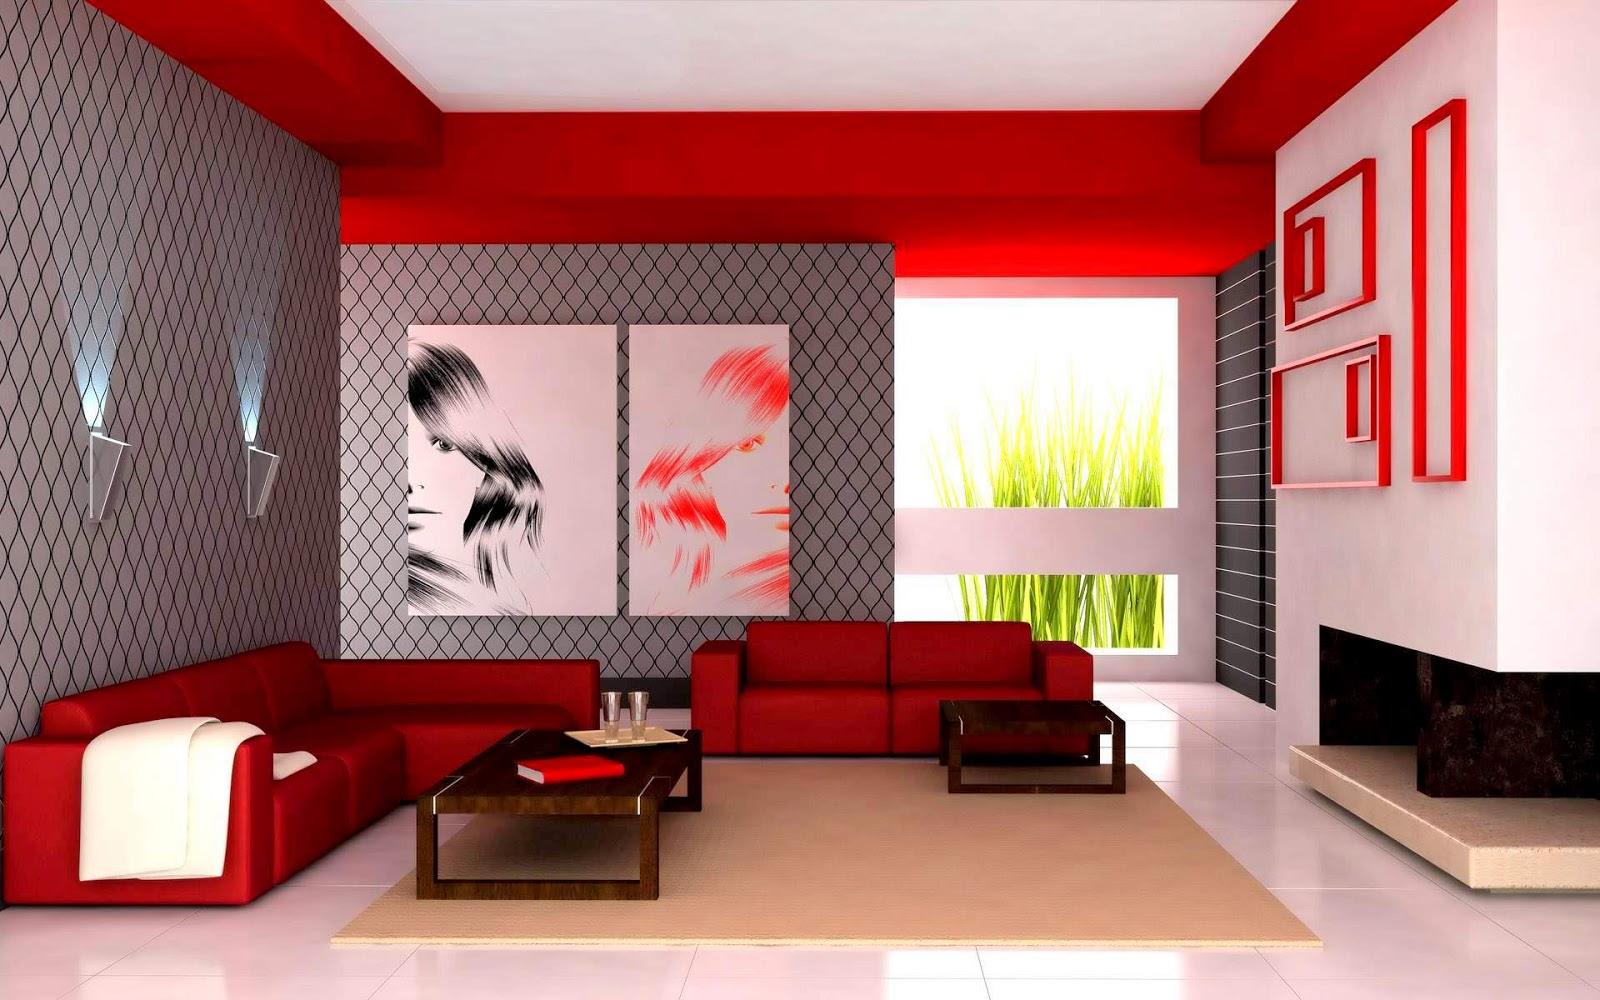 Dekorasi Ruang Tamu A Moden Dengan Warna Merah Terang